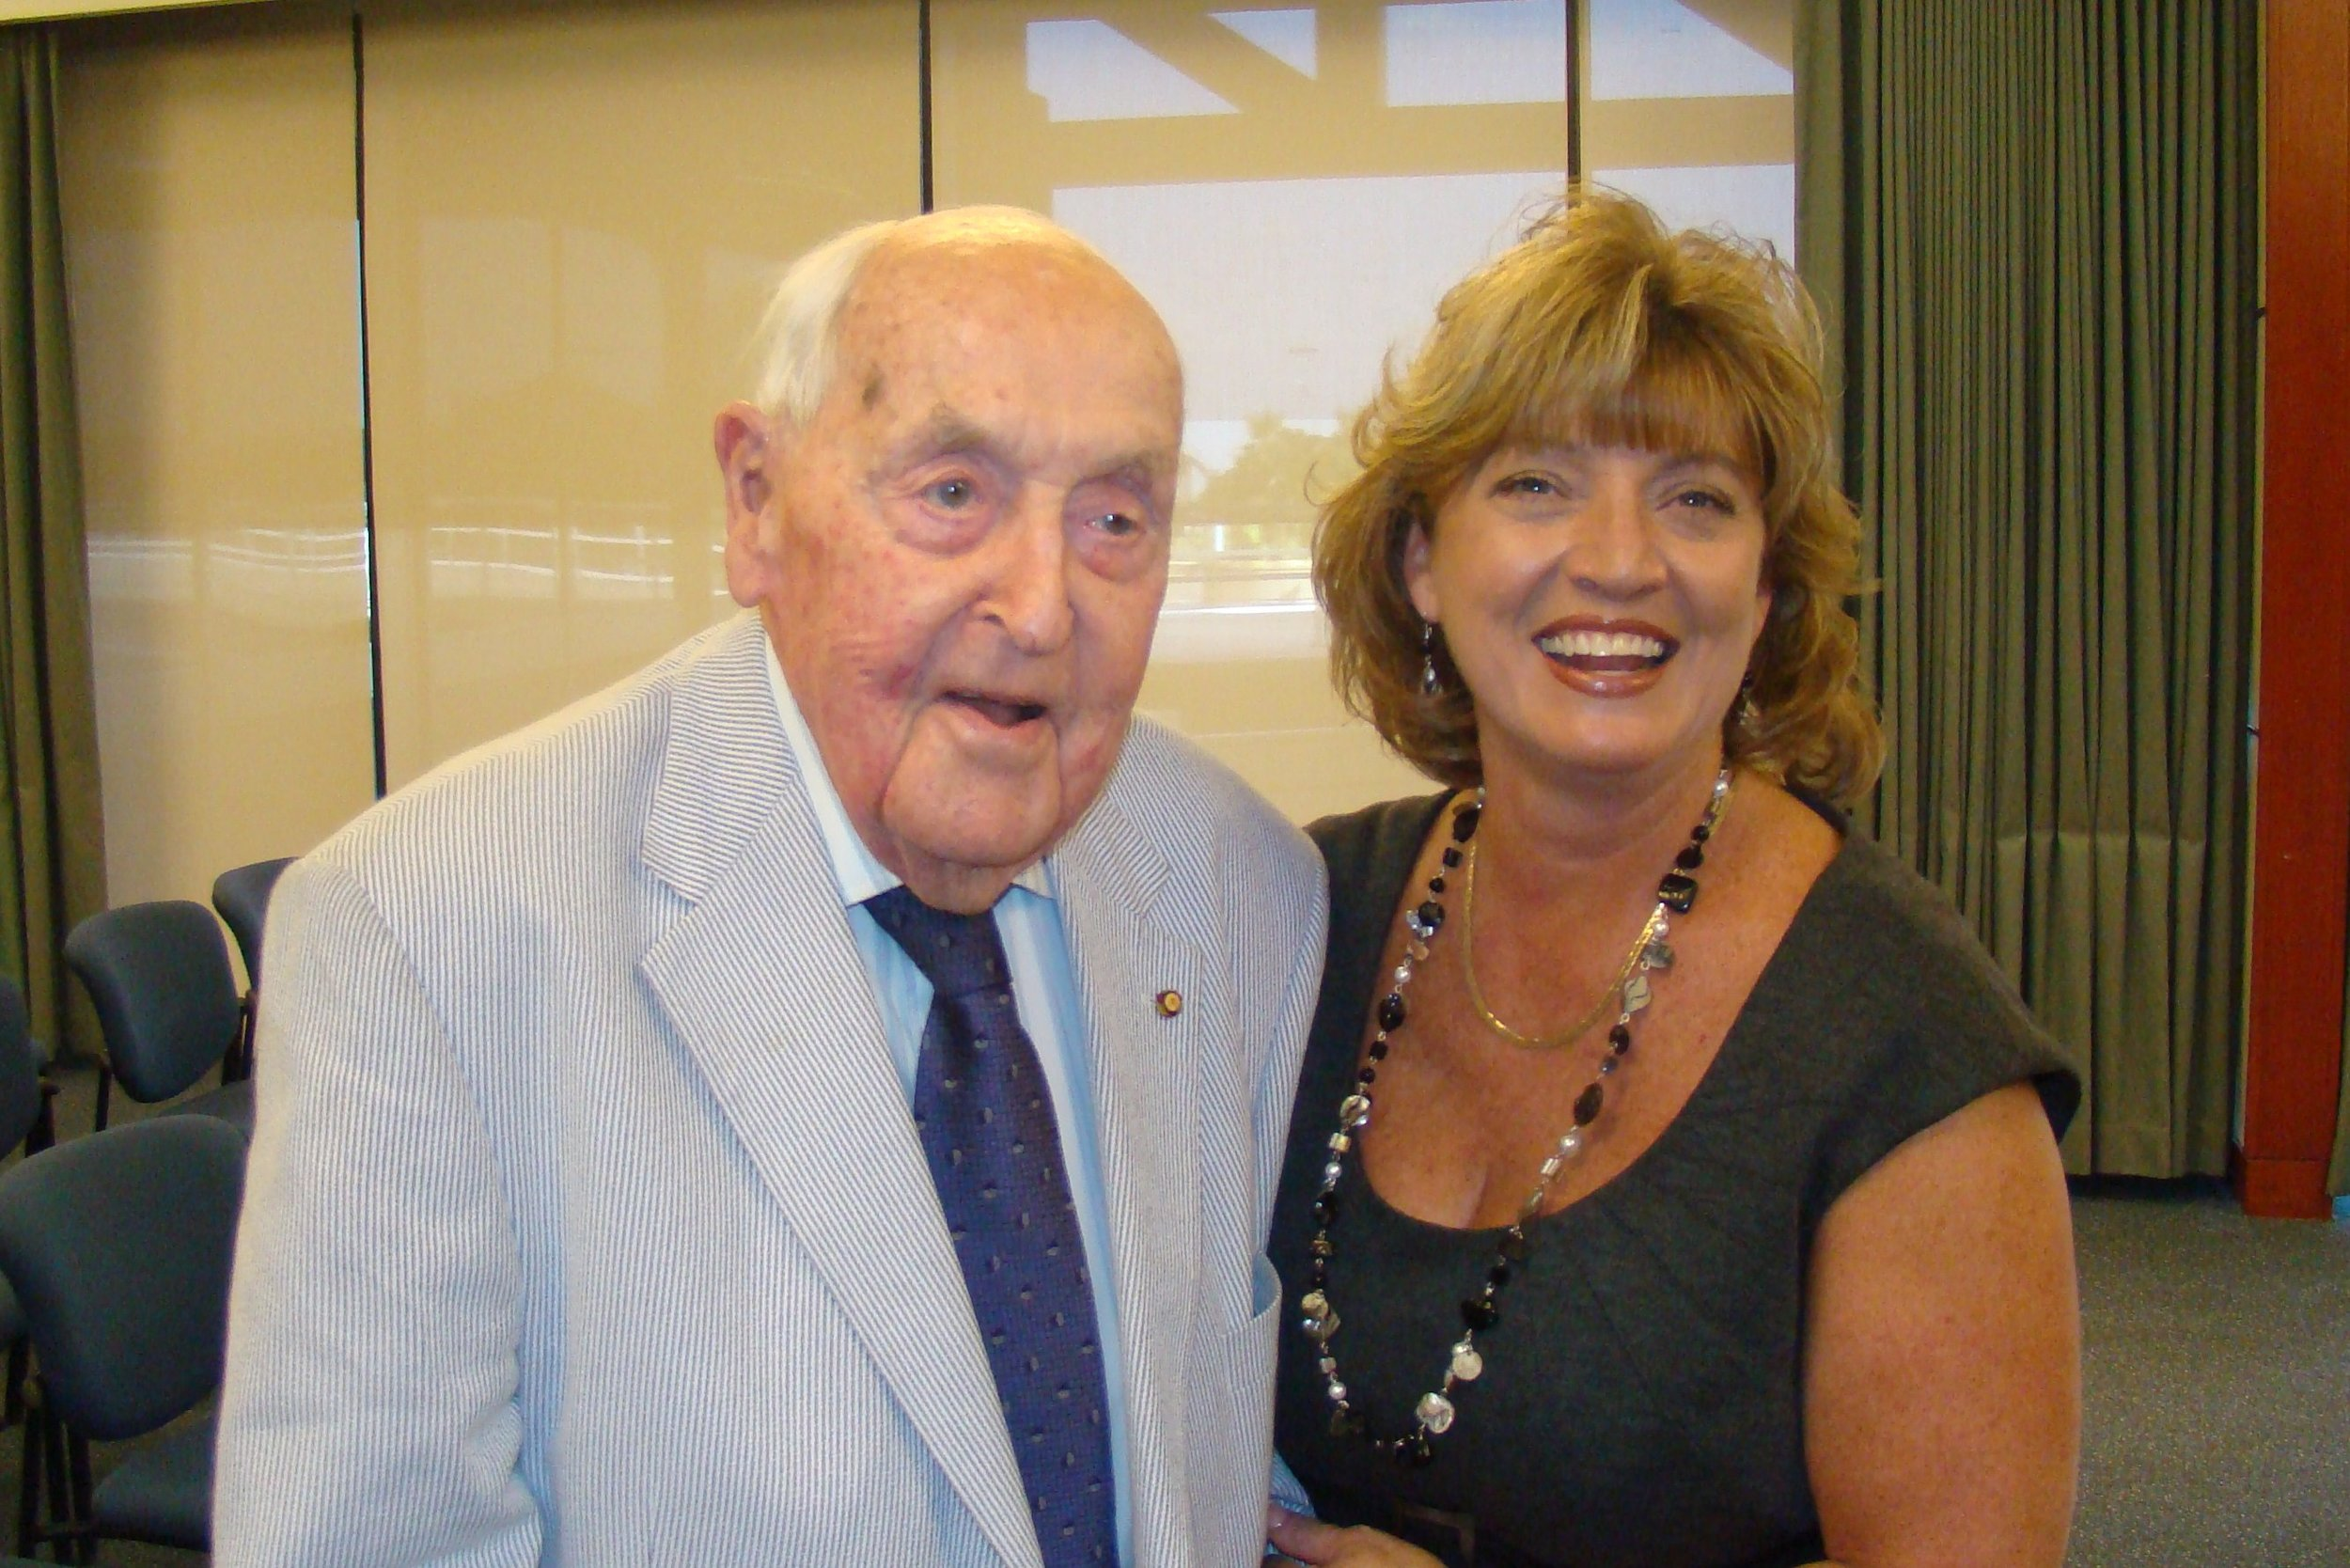 Sir Lenox & Colleen Picard - 1, 27 Oct '11.JPG